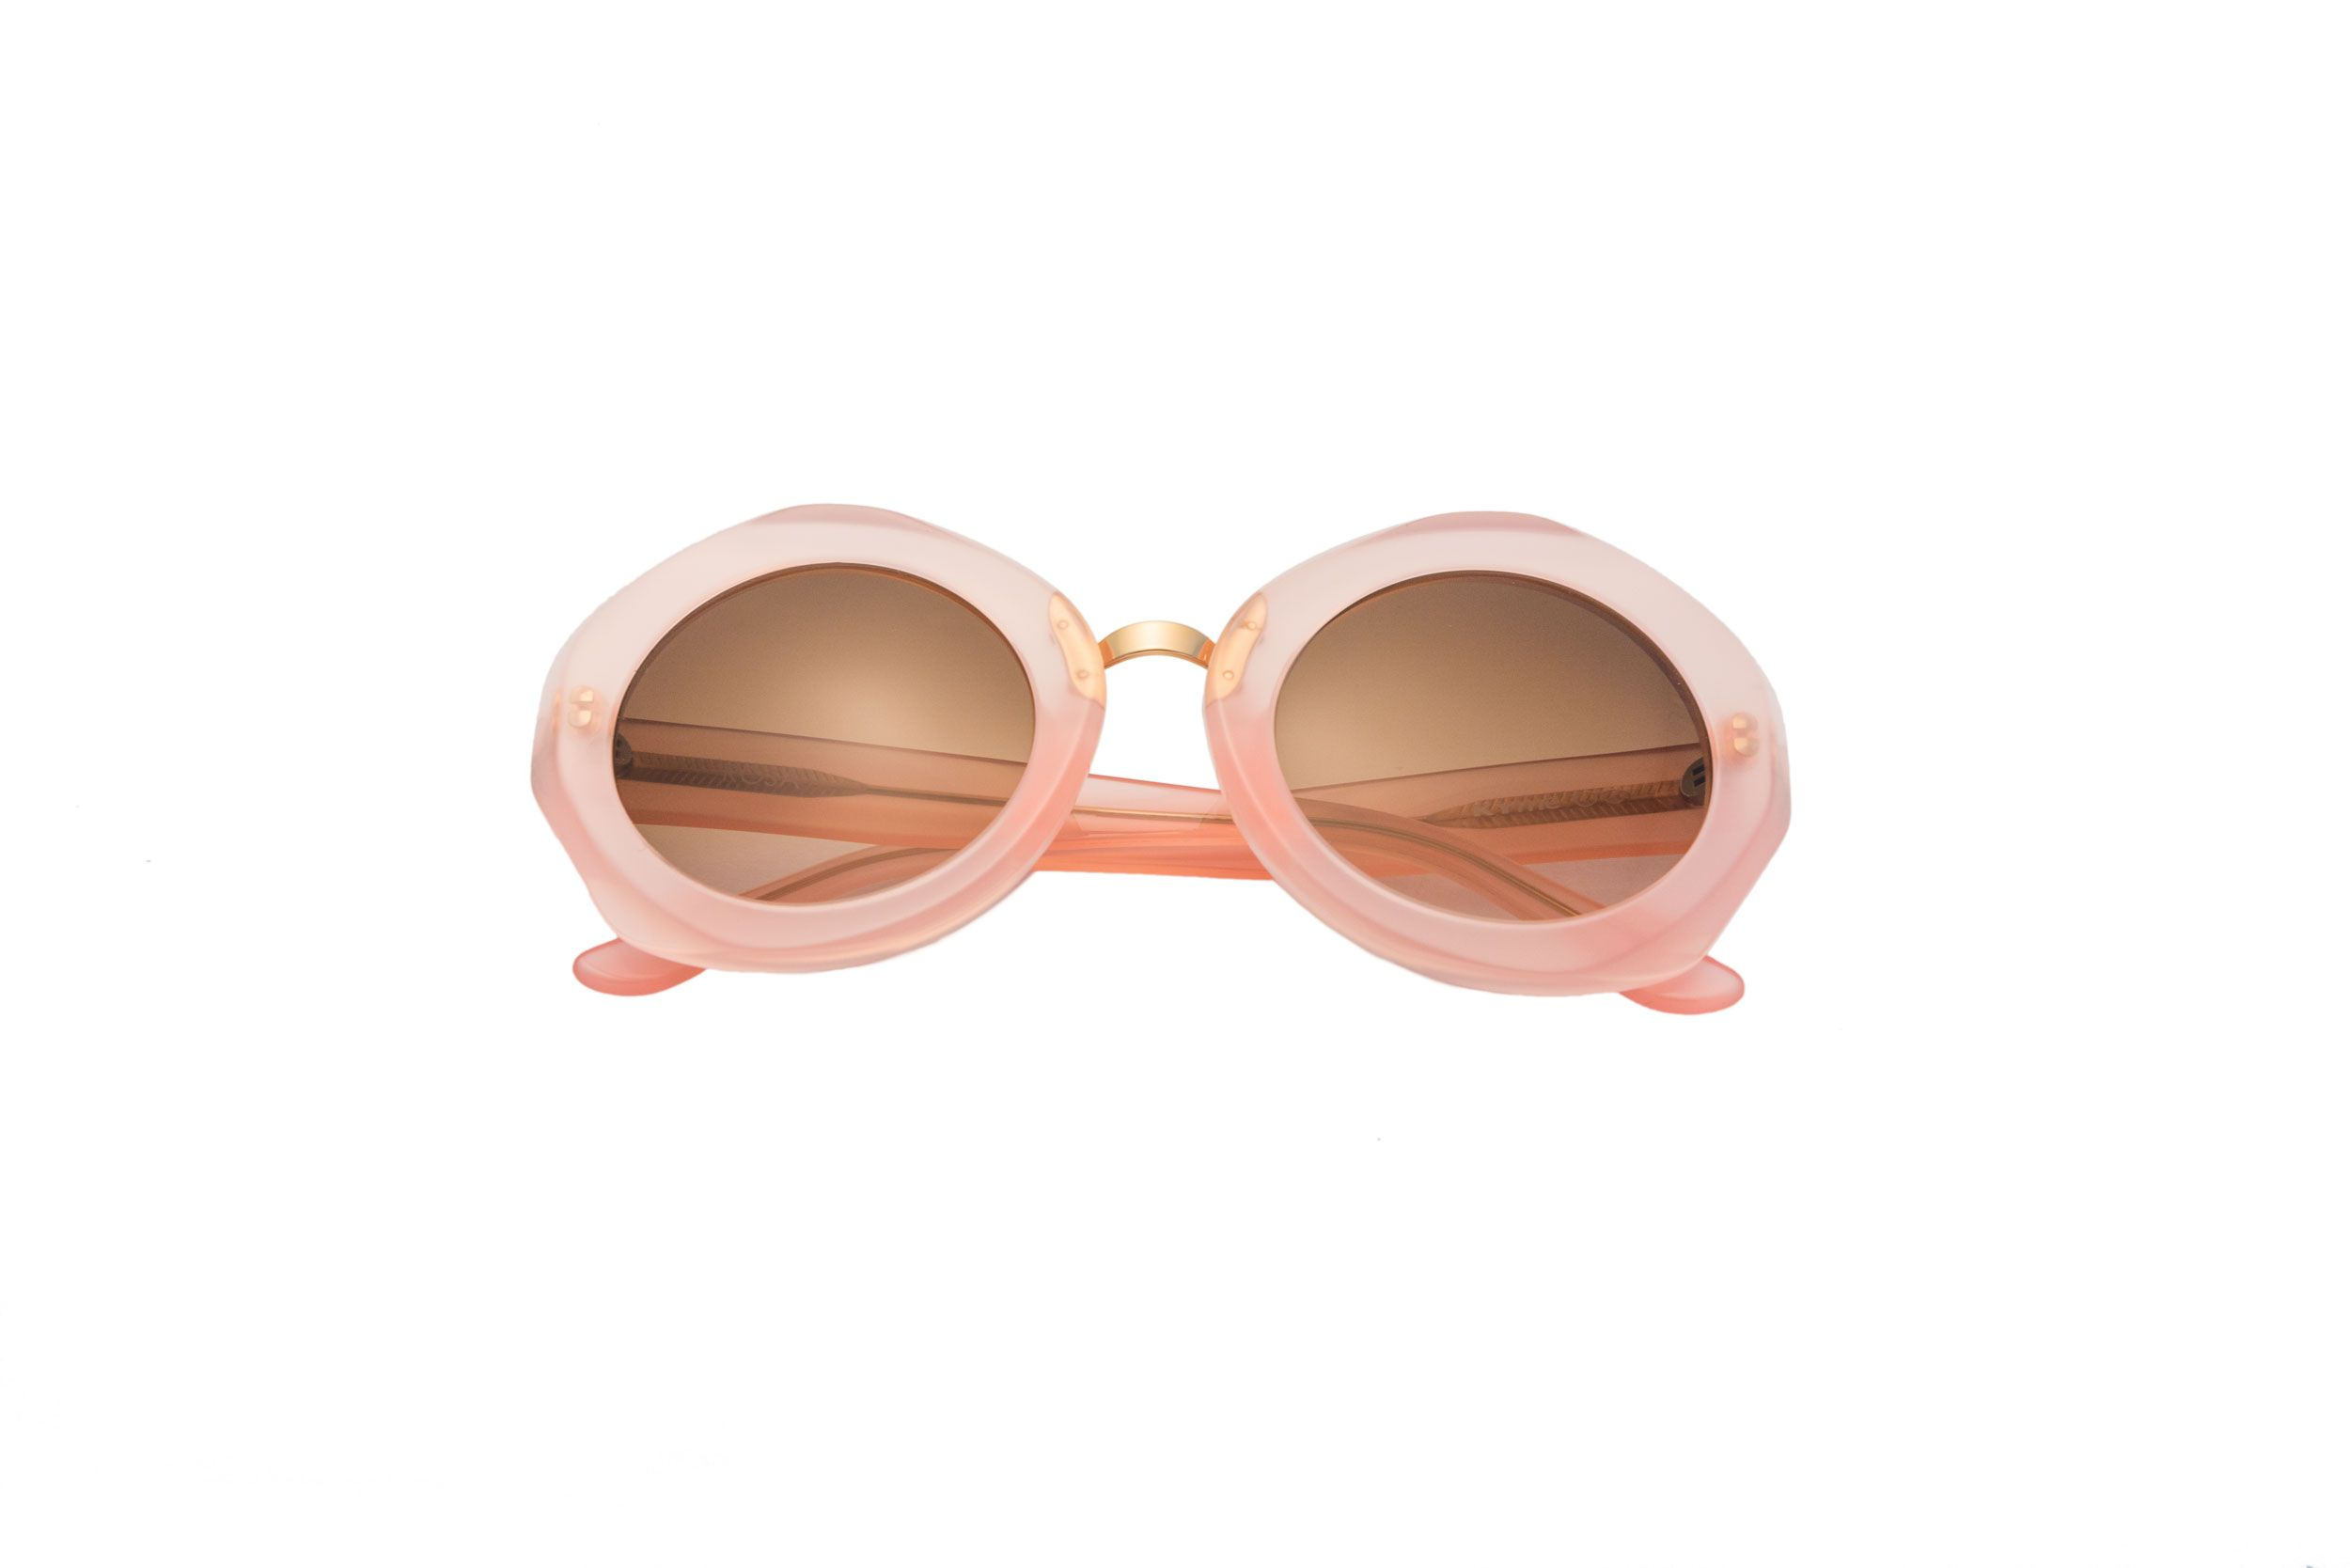 ROSA POWDER PINK & ROSE GOLD – Kyme Sunglasses | glasses | Pinterest